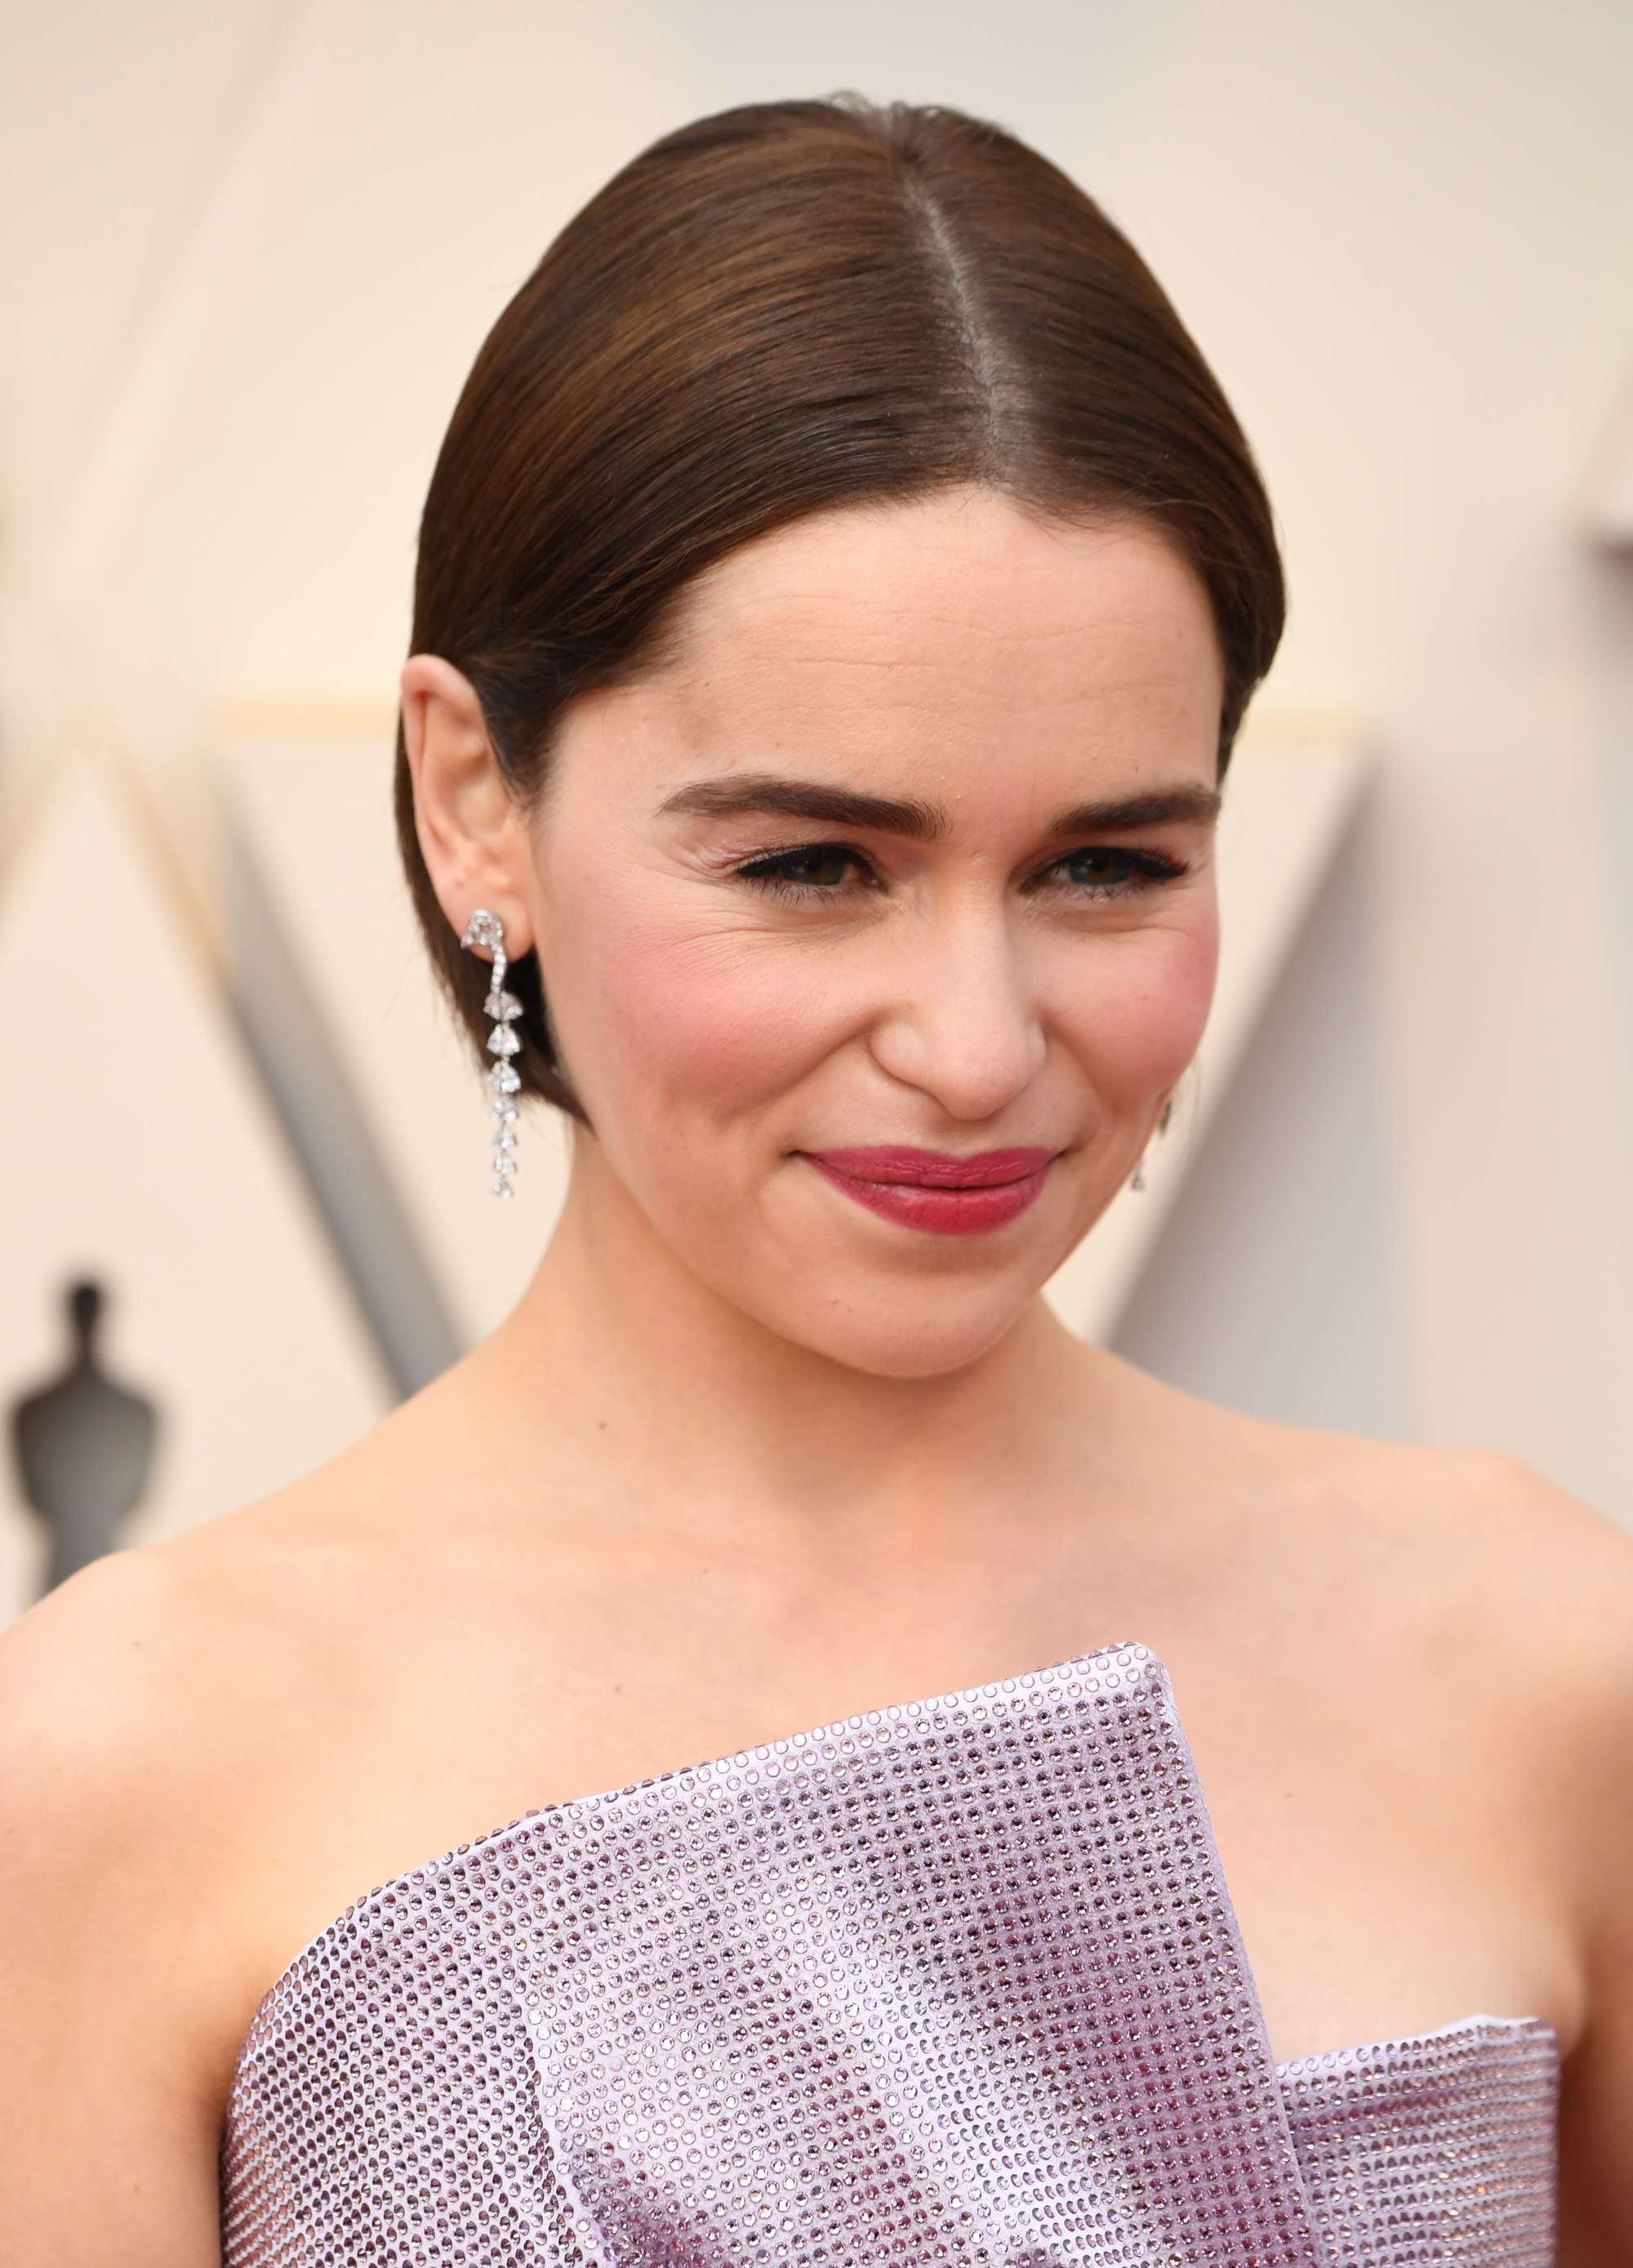 Oscars 2019 hairstyles: Emilia Clarke at the 2019 Oscars with a dark brown sleek short bob